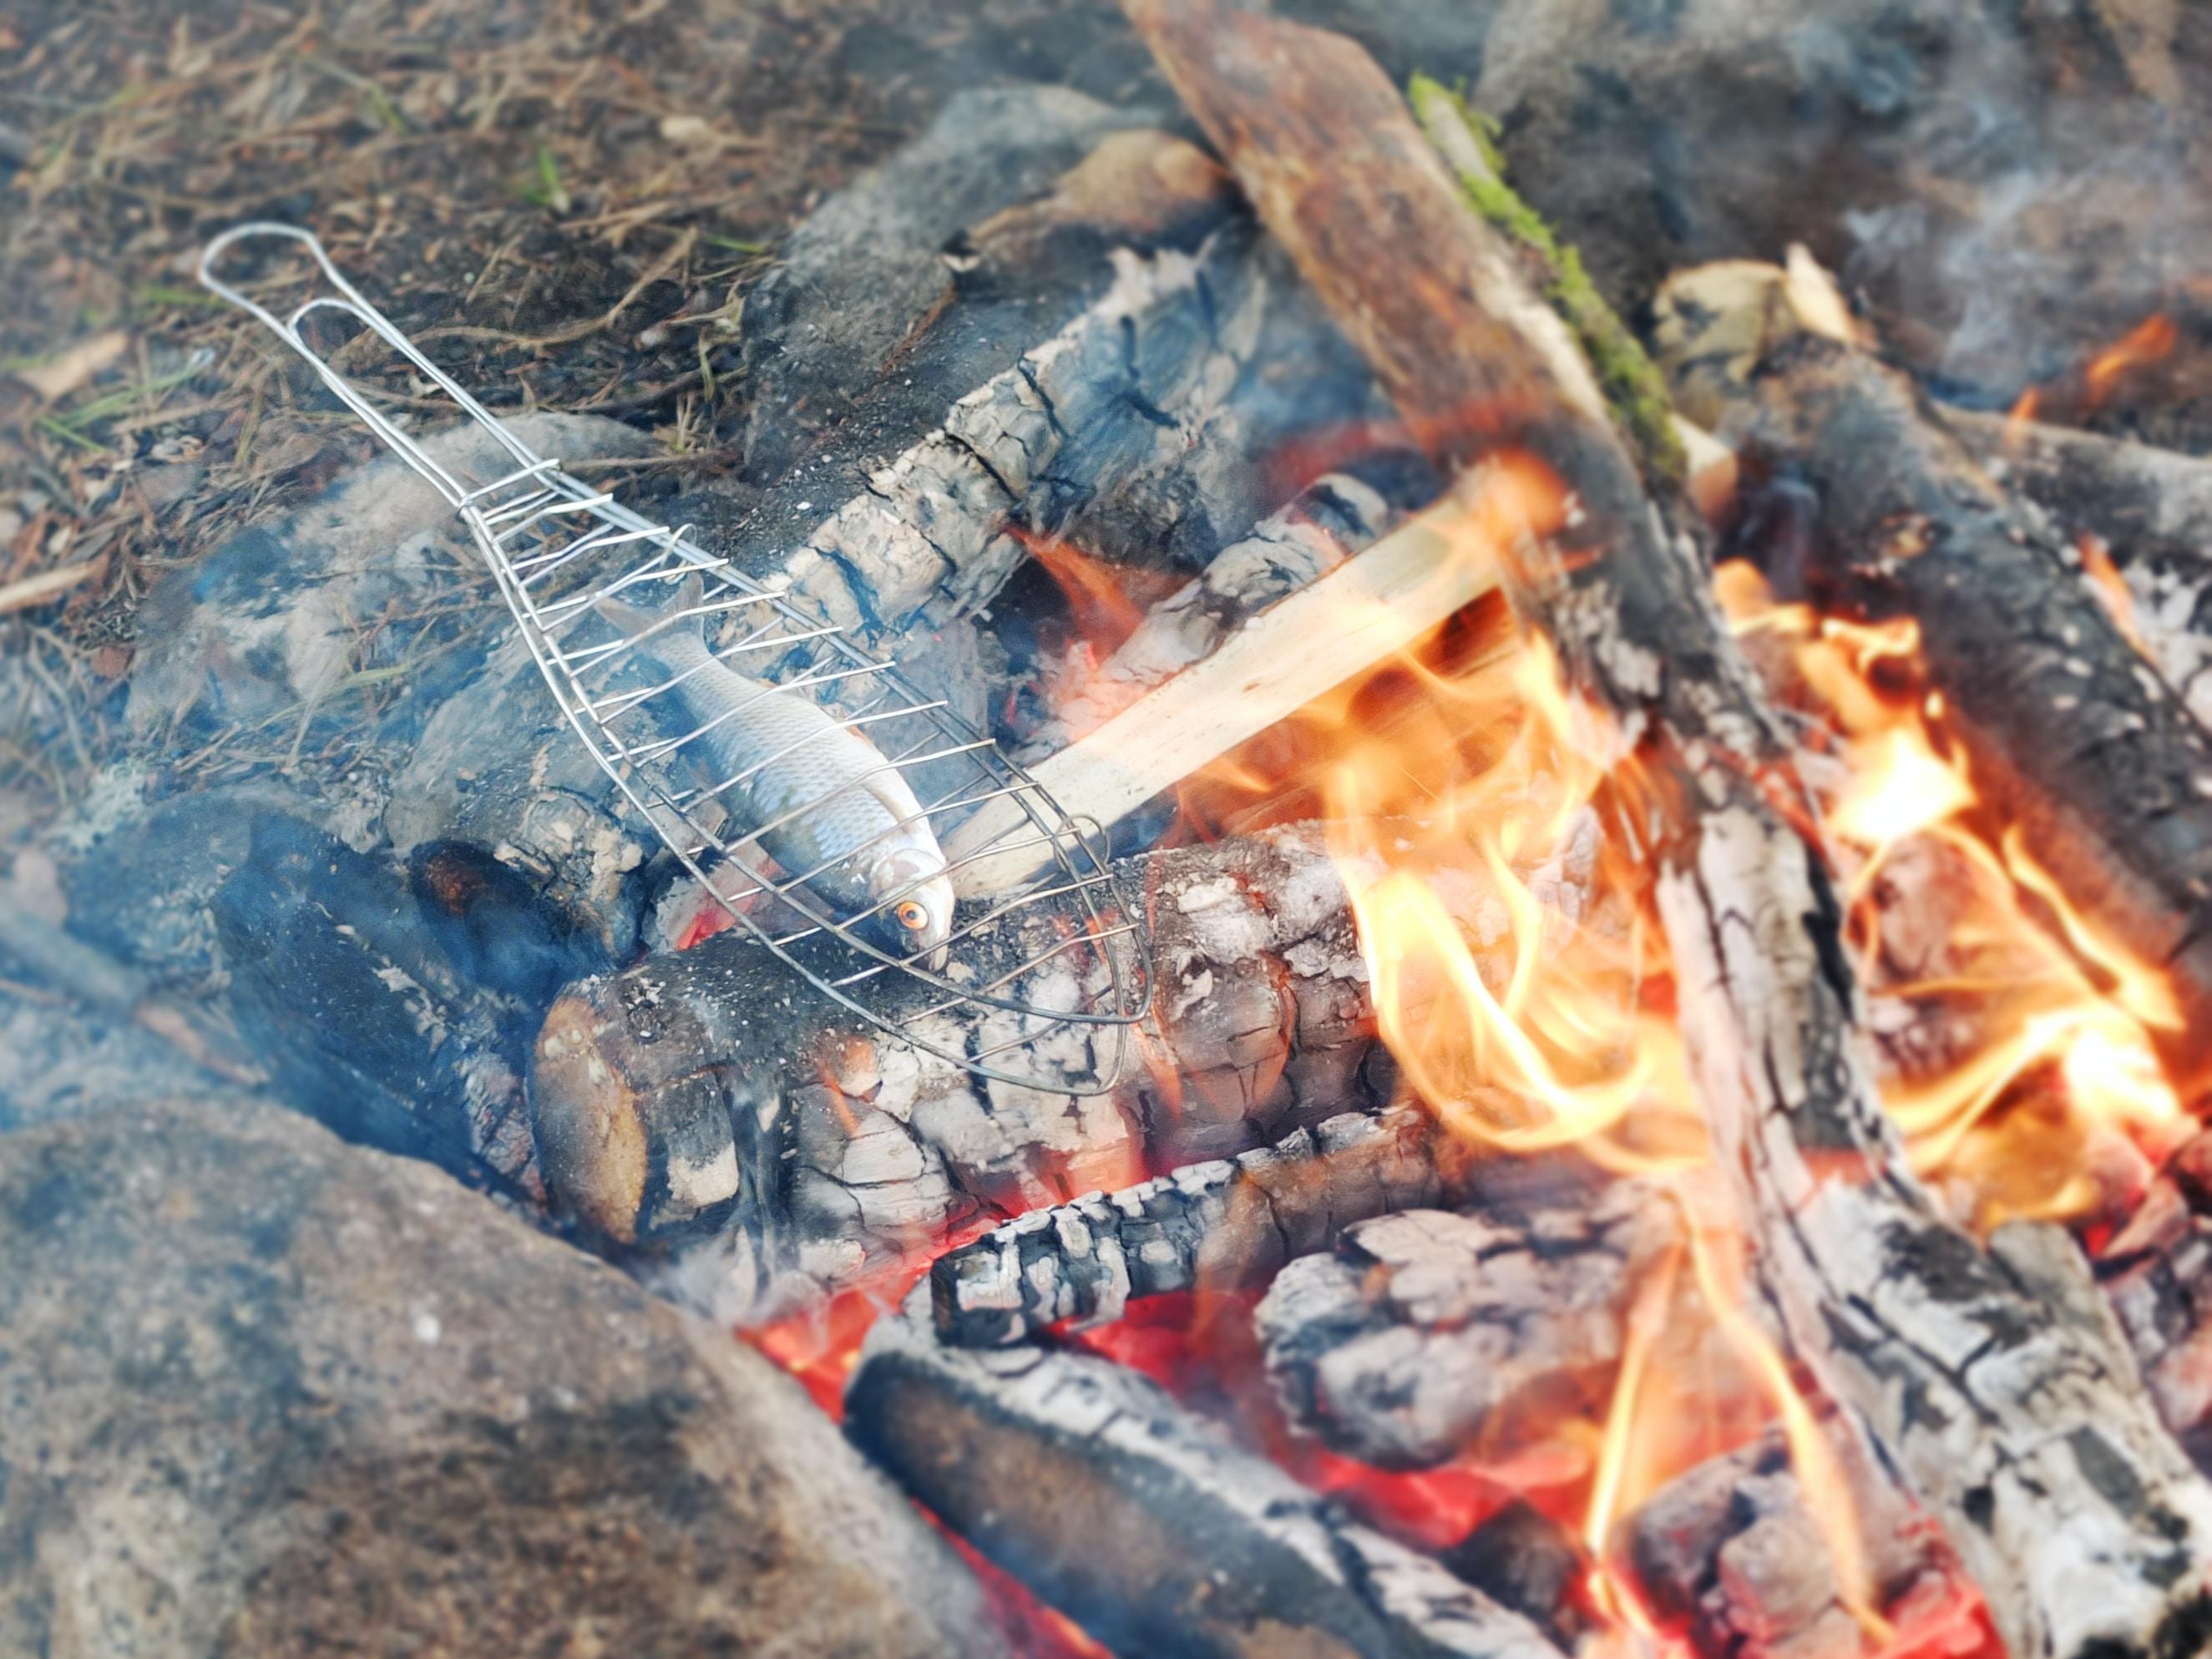 gray fish on burning woods at daytime